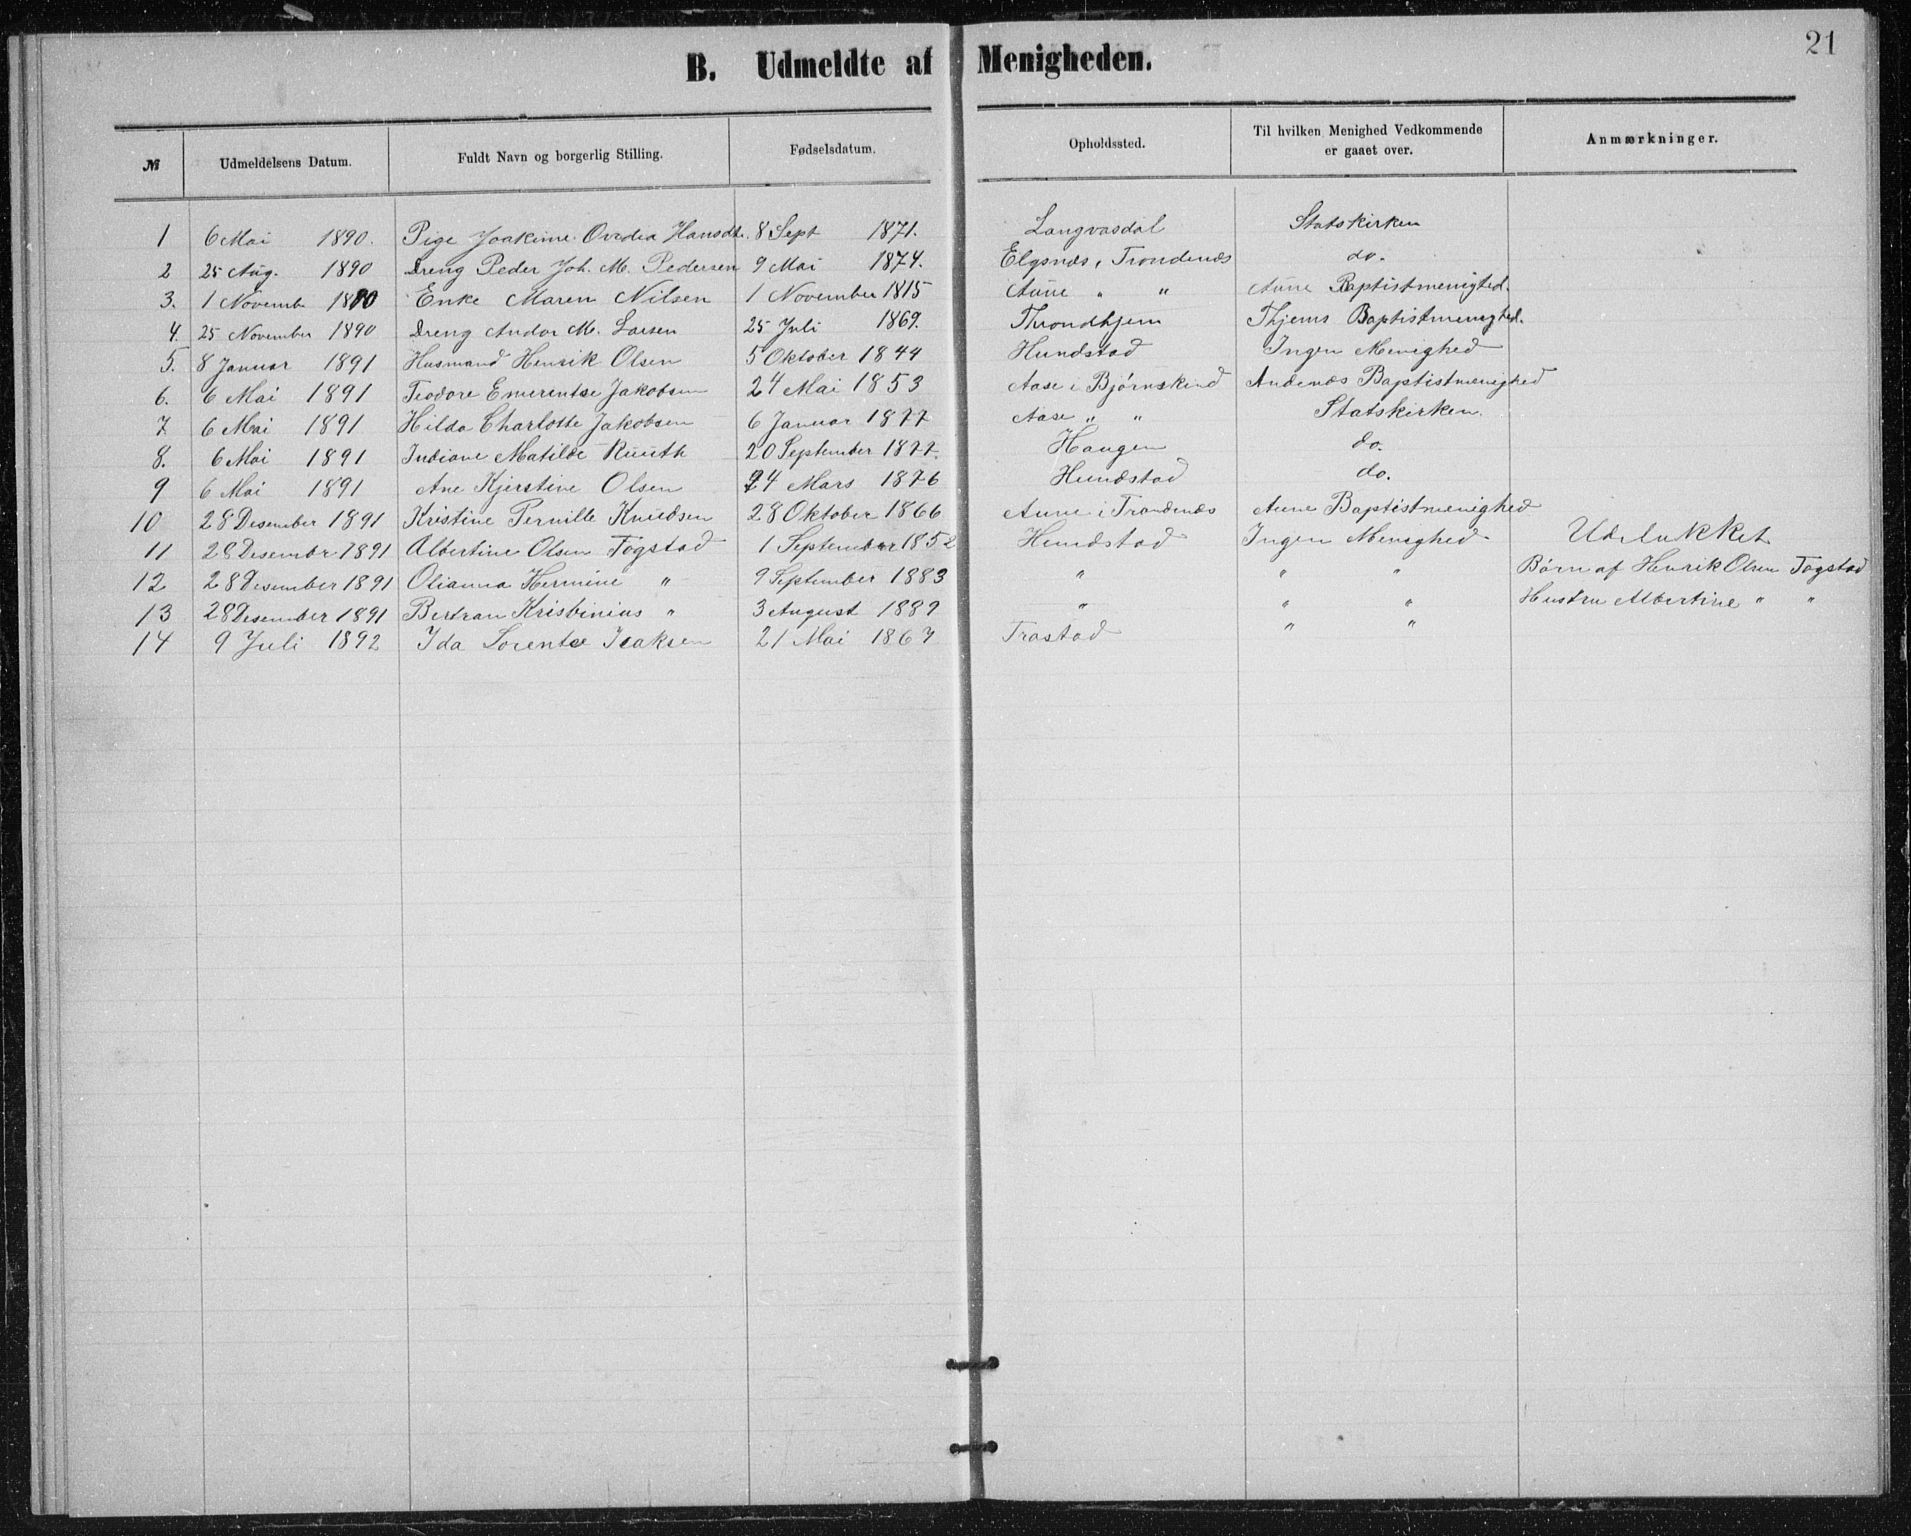 SATØ, Uten arkivreferanse, Dissenter register no. DP 4, 1877-1892, p. 21